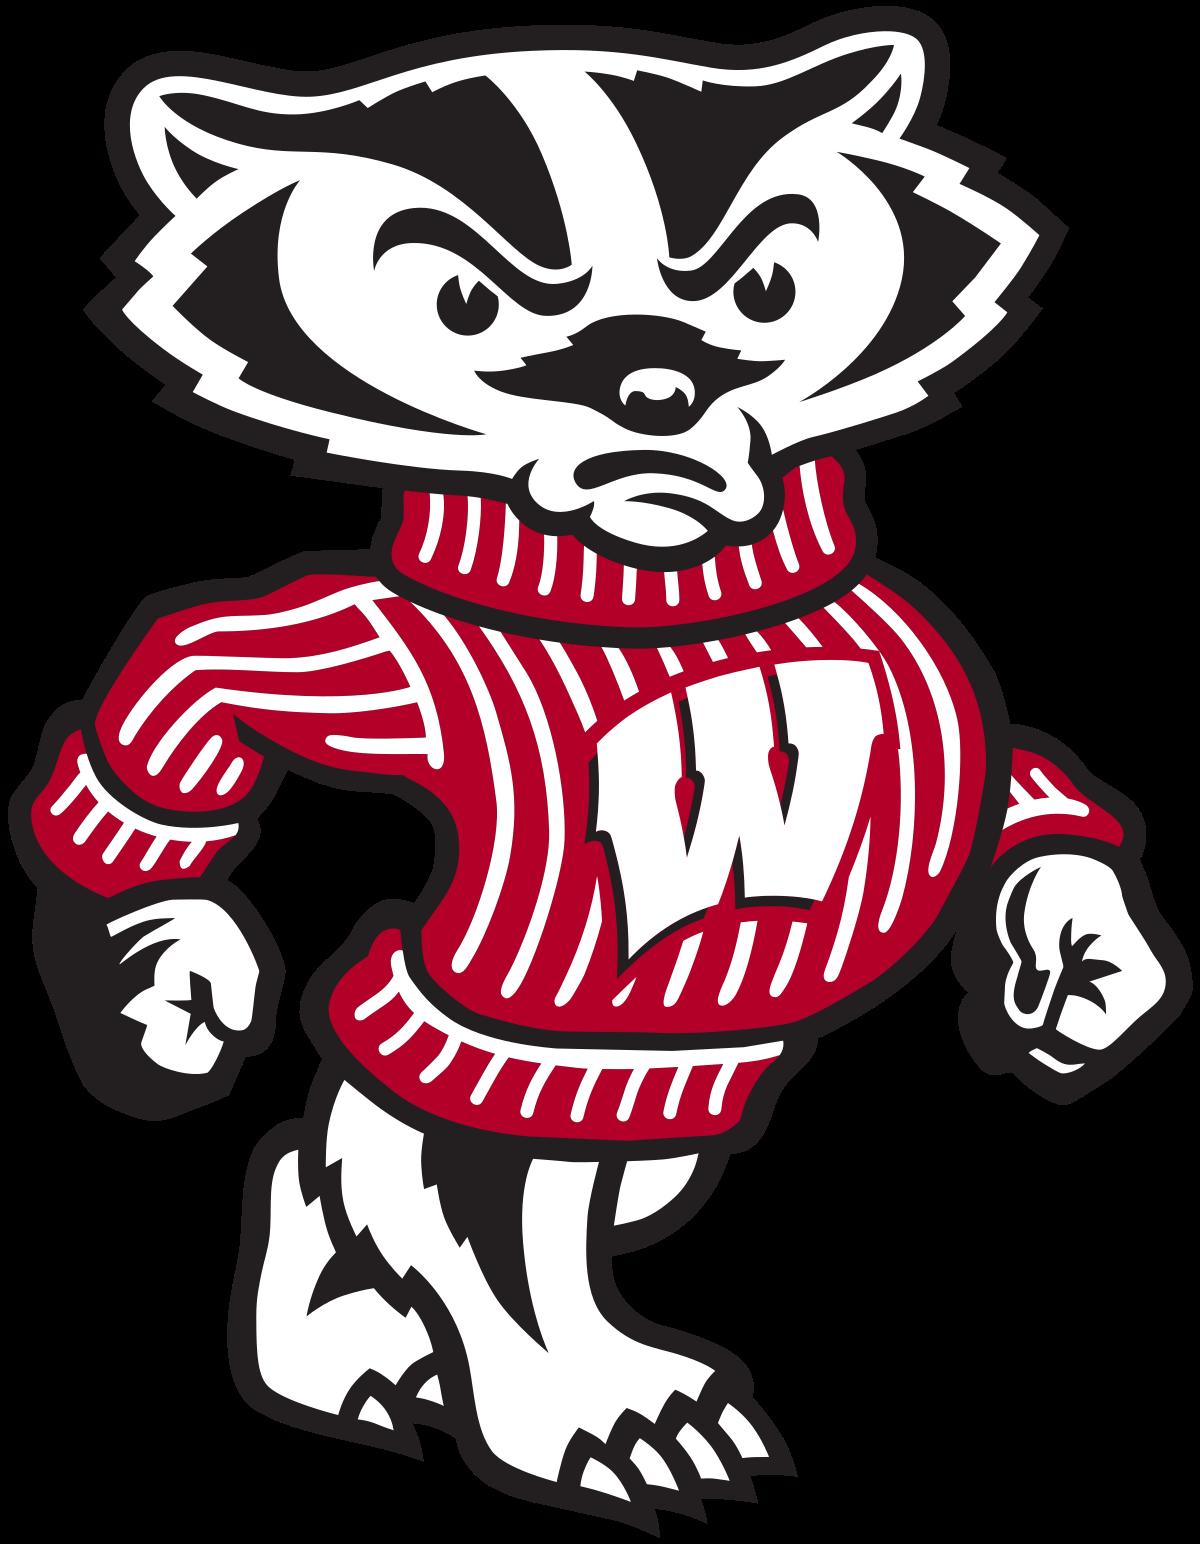 Badger mascot clipart picture transparent download Bucky Badger - Wikipedia picture transparent download